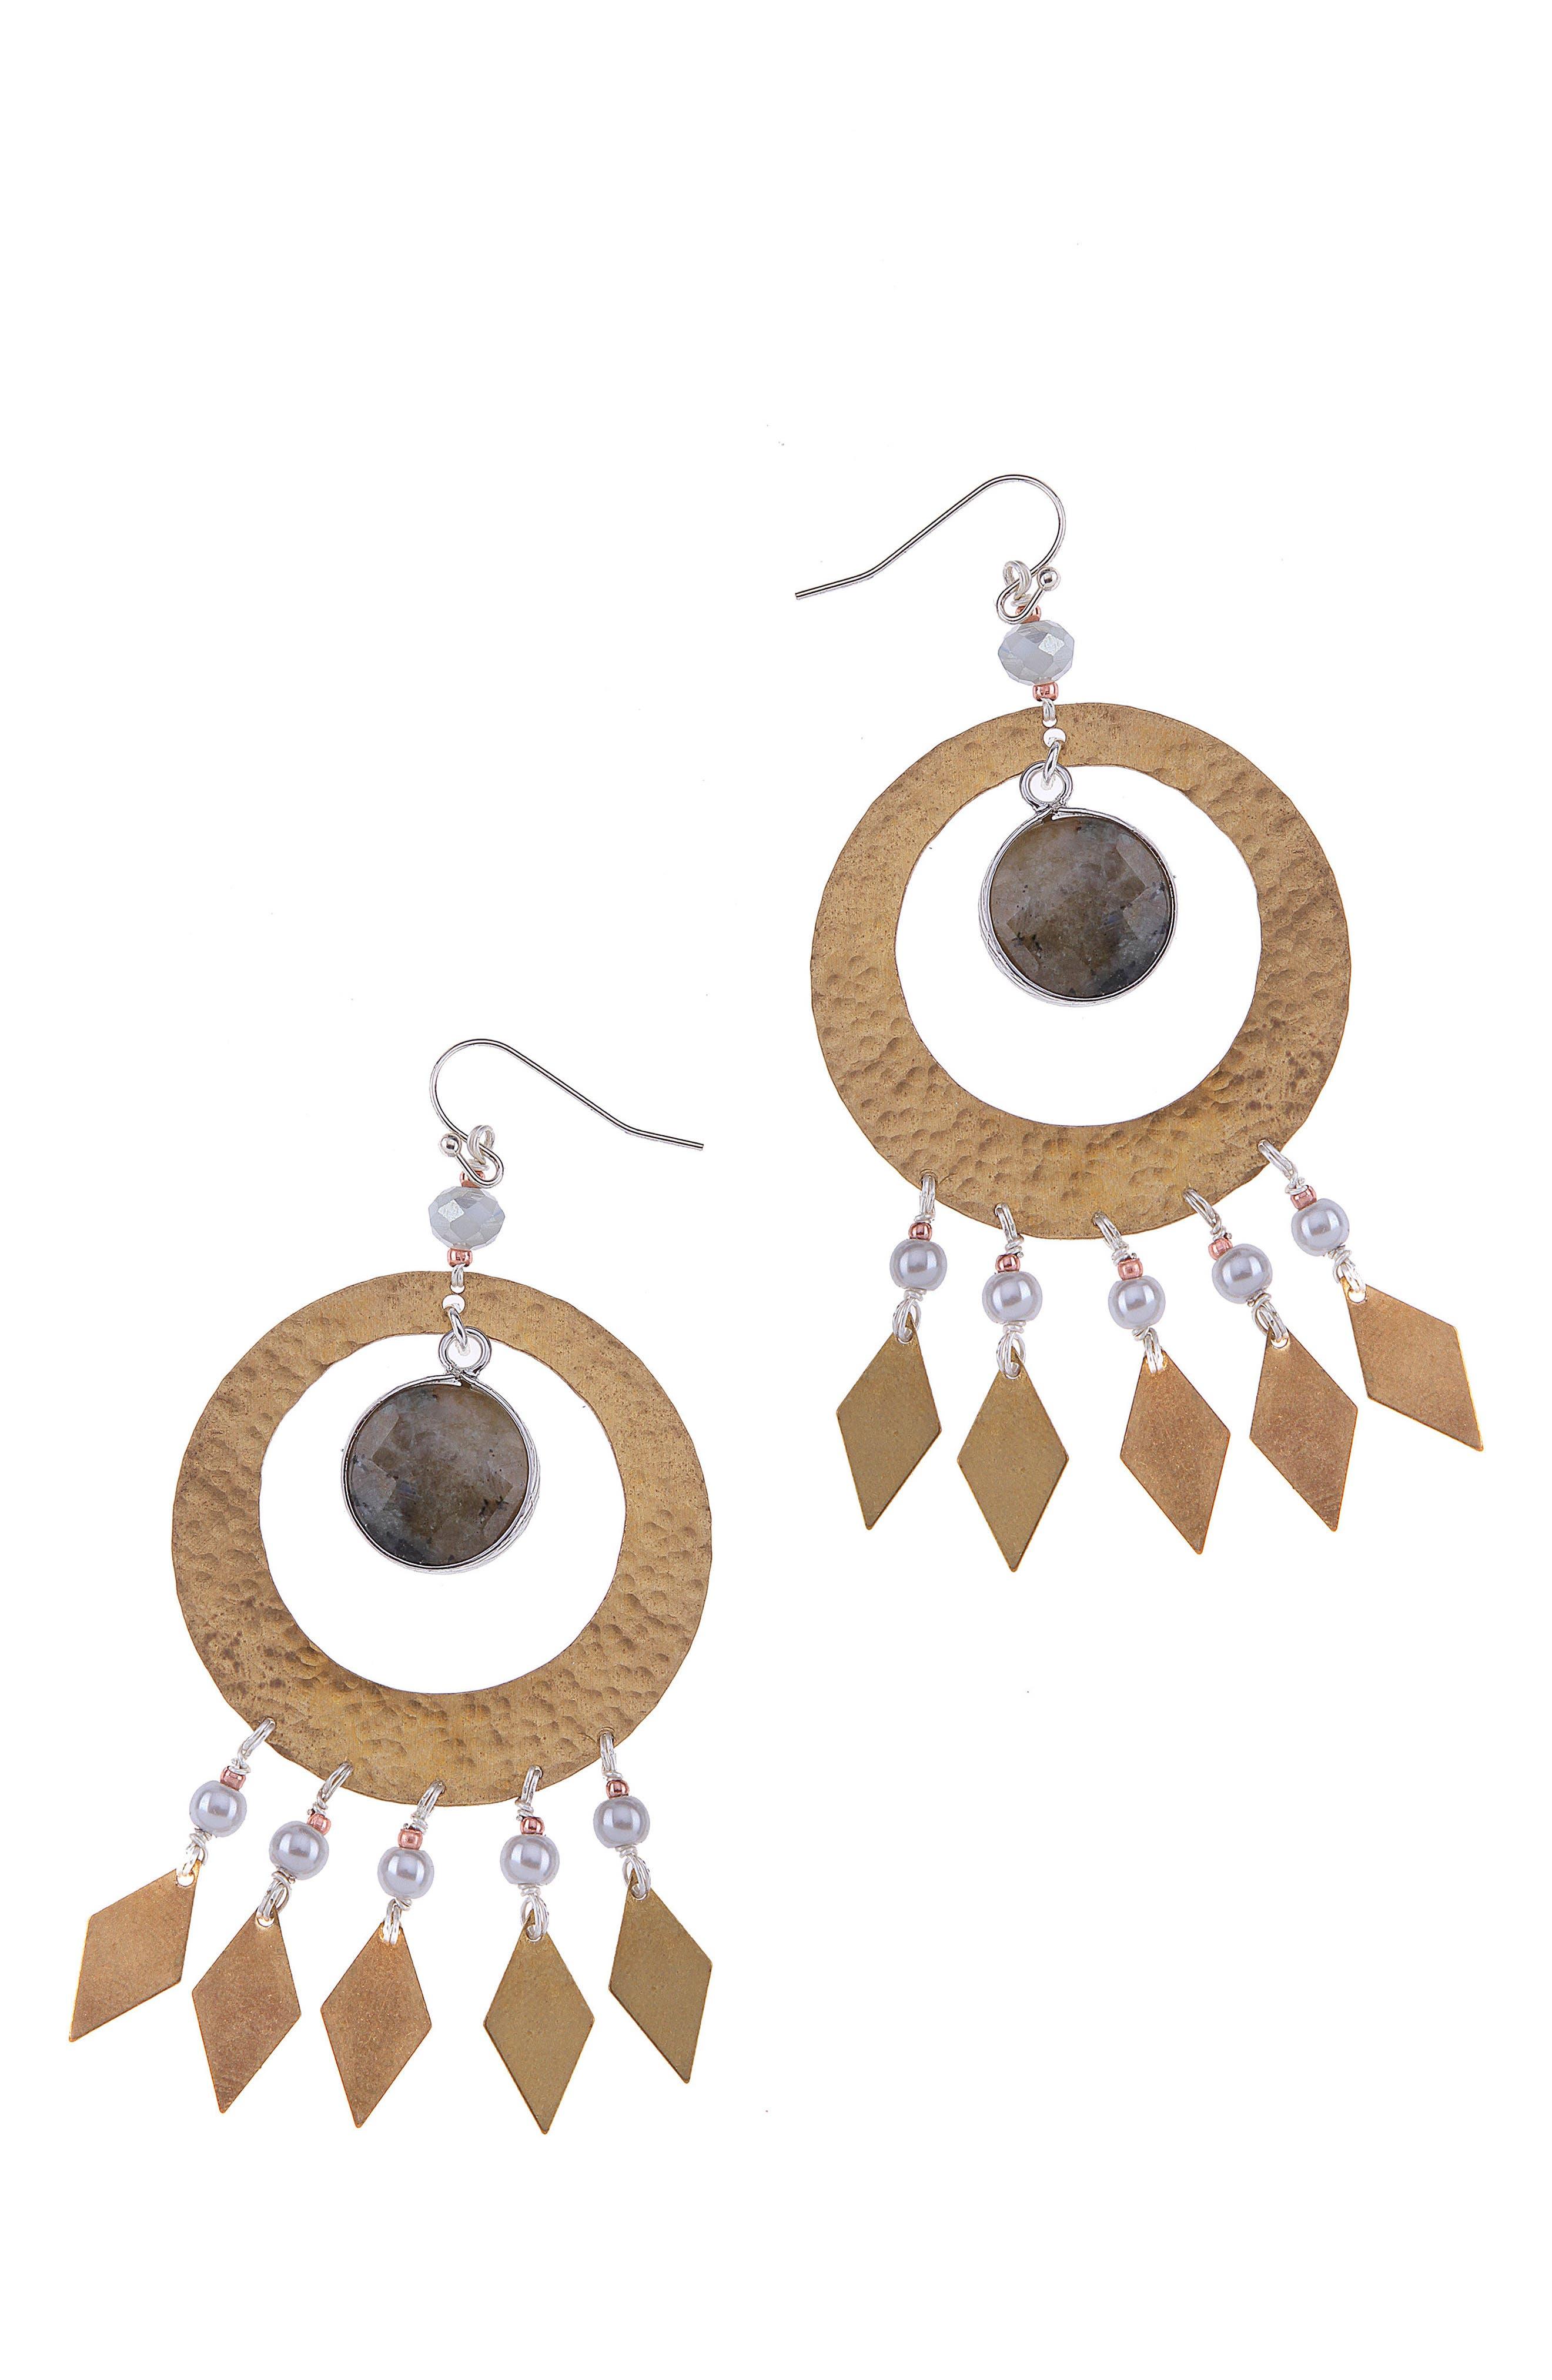 Labradorite & Imitation Pearl Statement Earrings,                         Main,                         color, 020